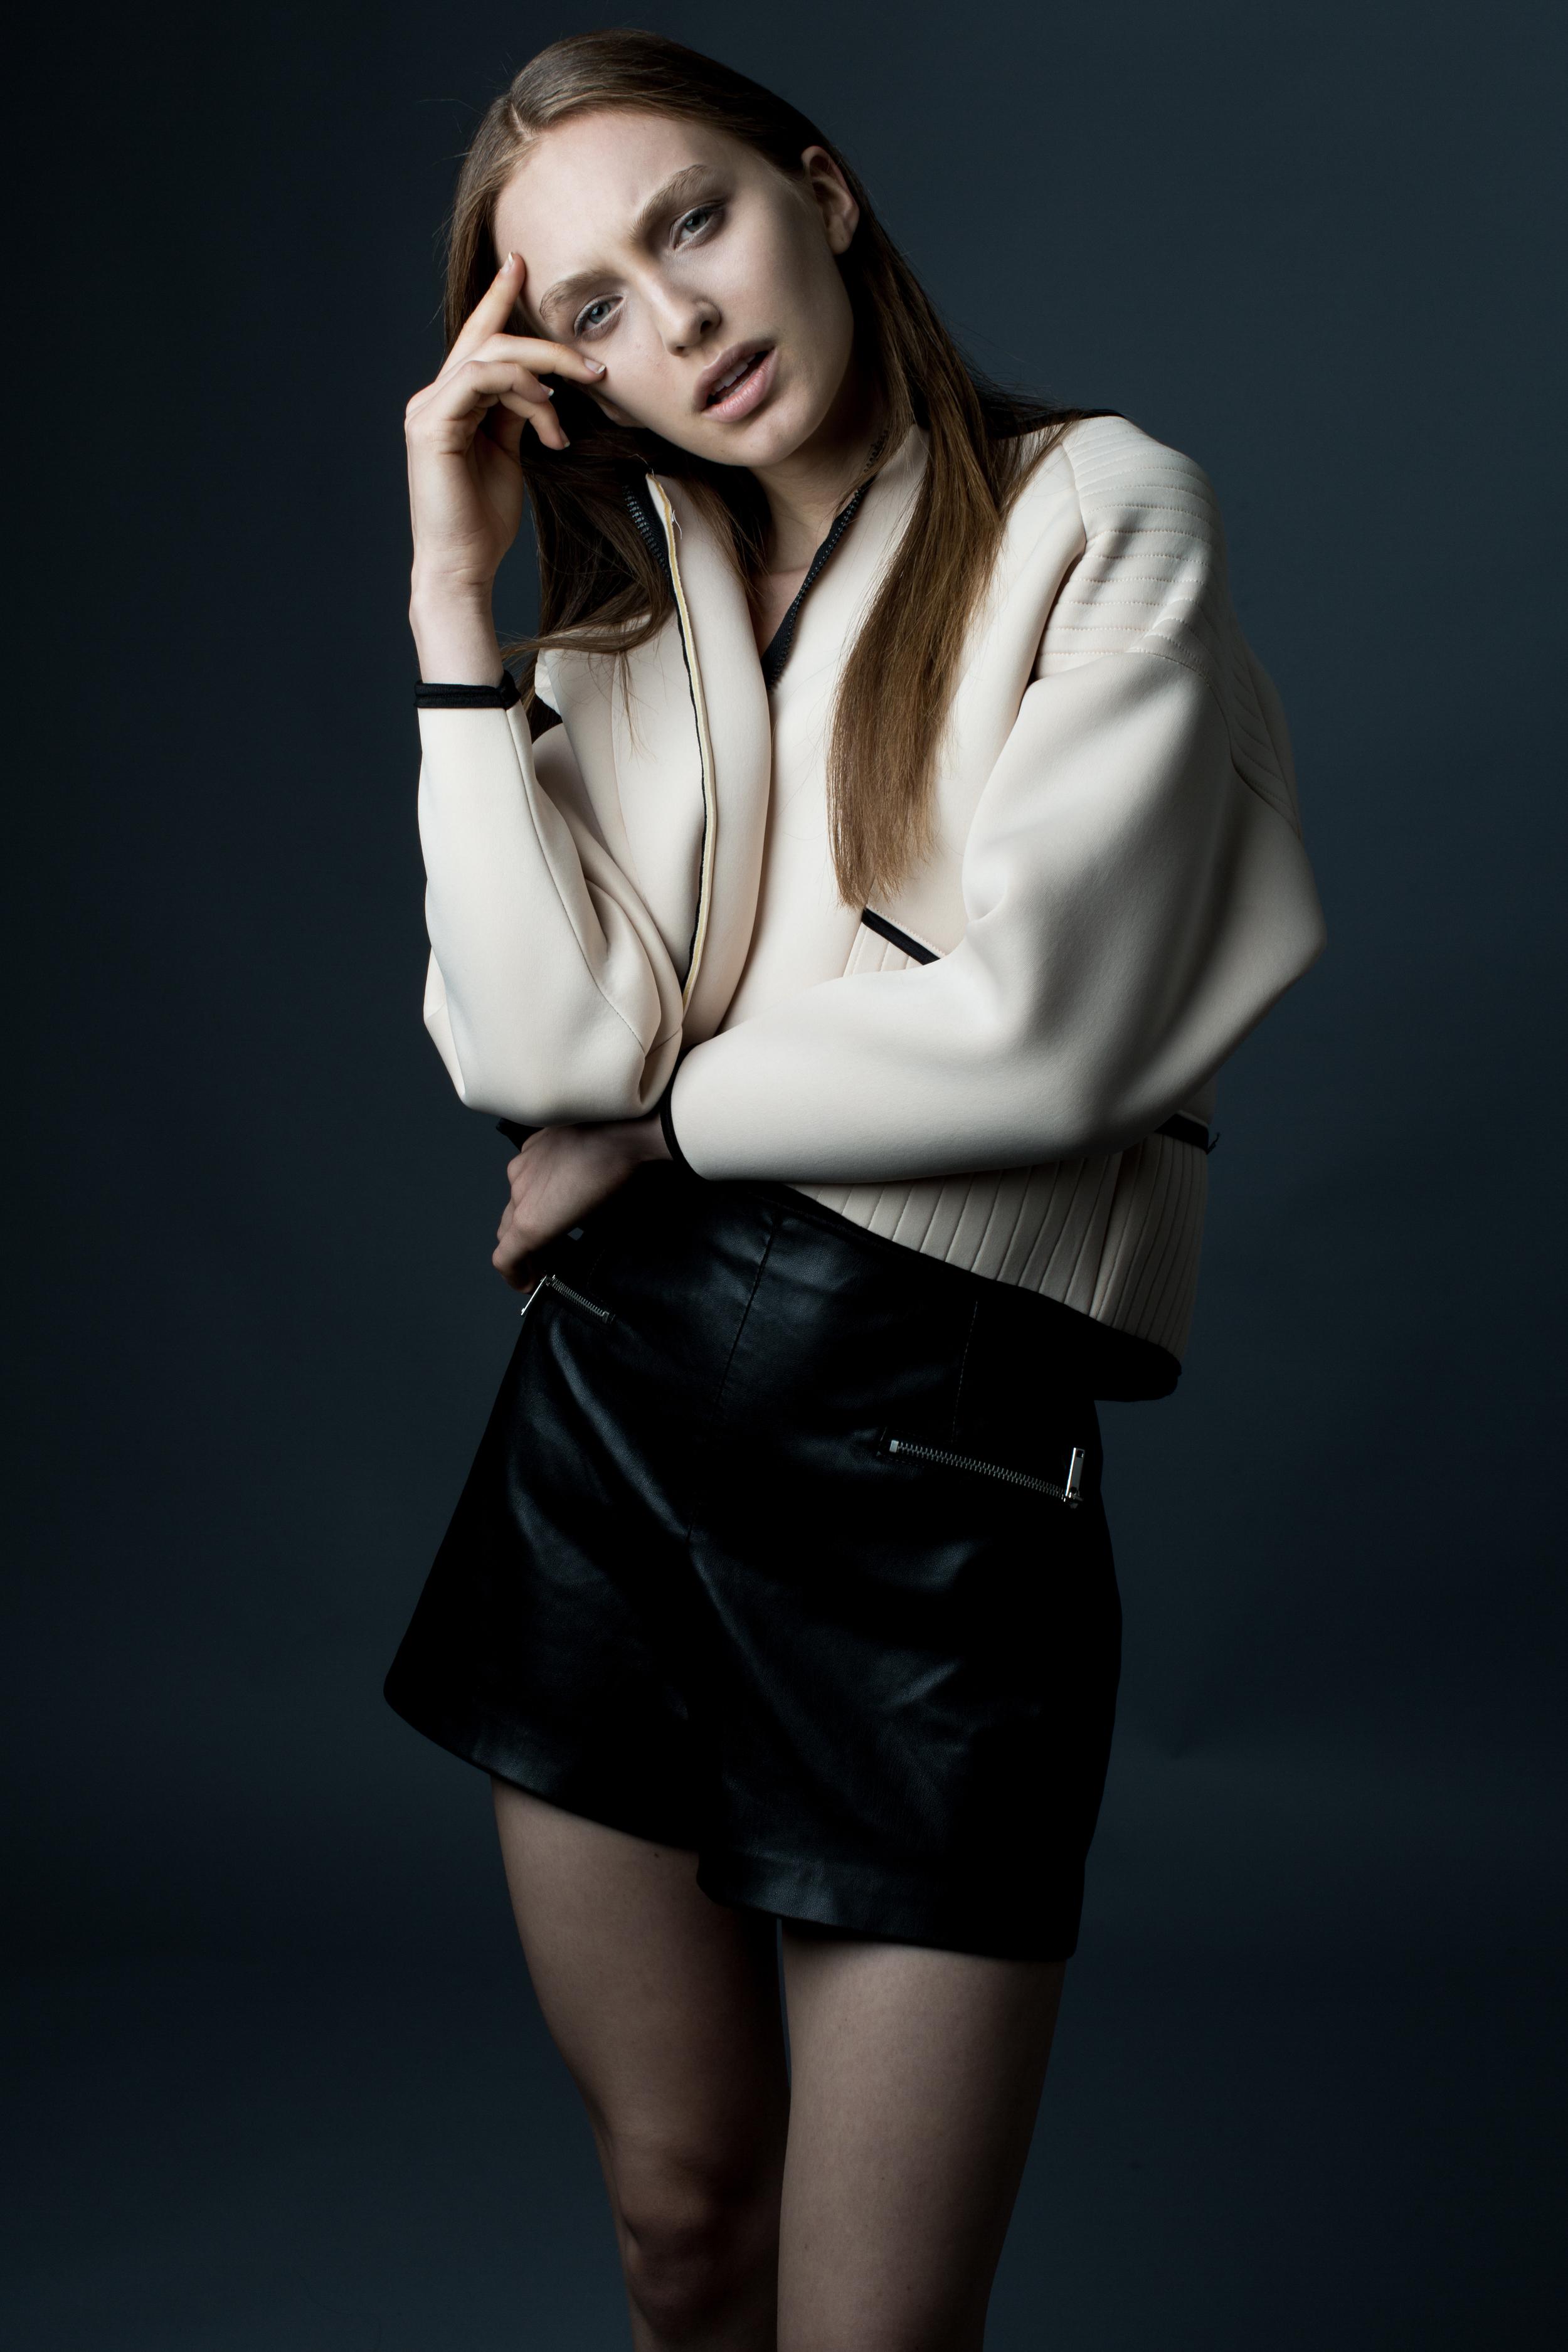 model CRYSTAL   photographer BONNIE NICHOALDS   styled by NIK